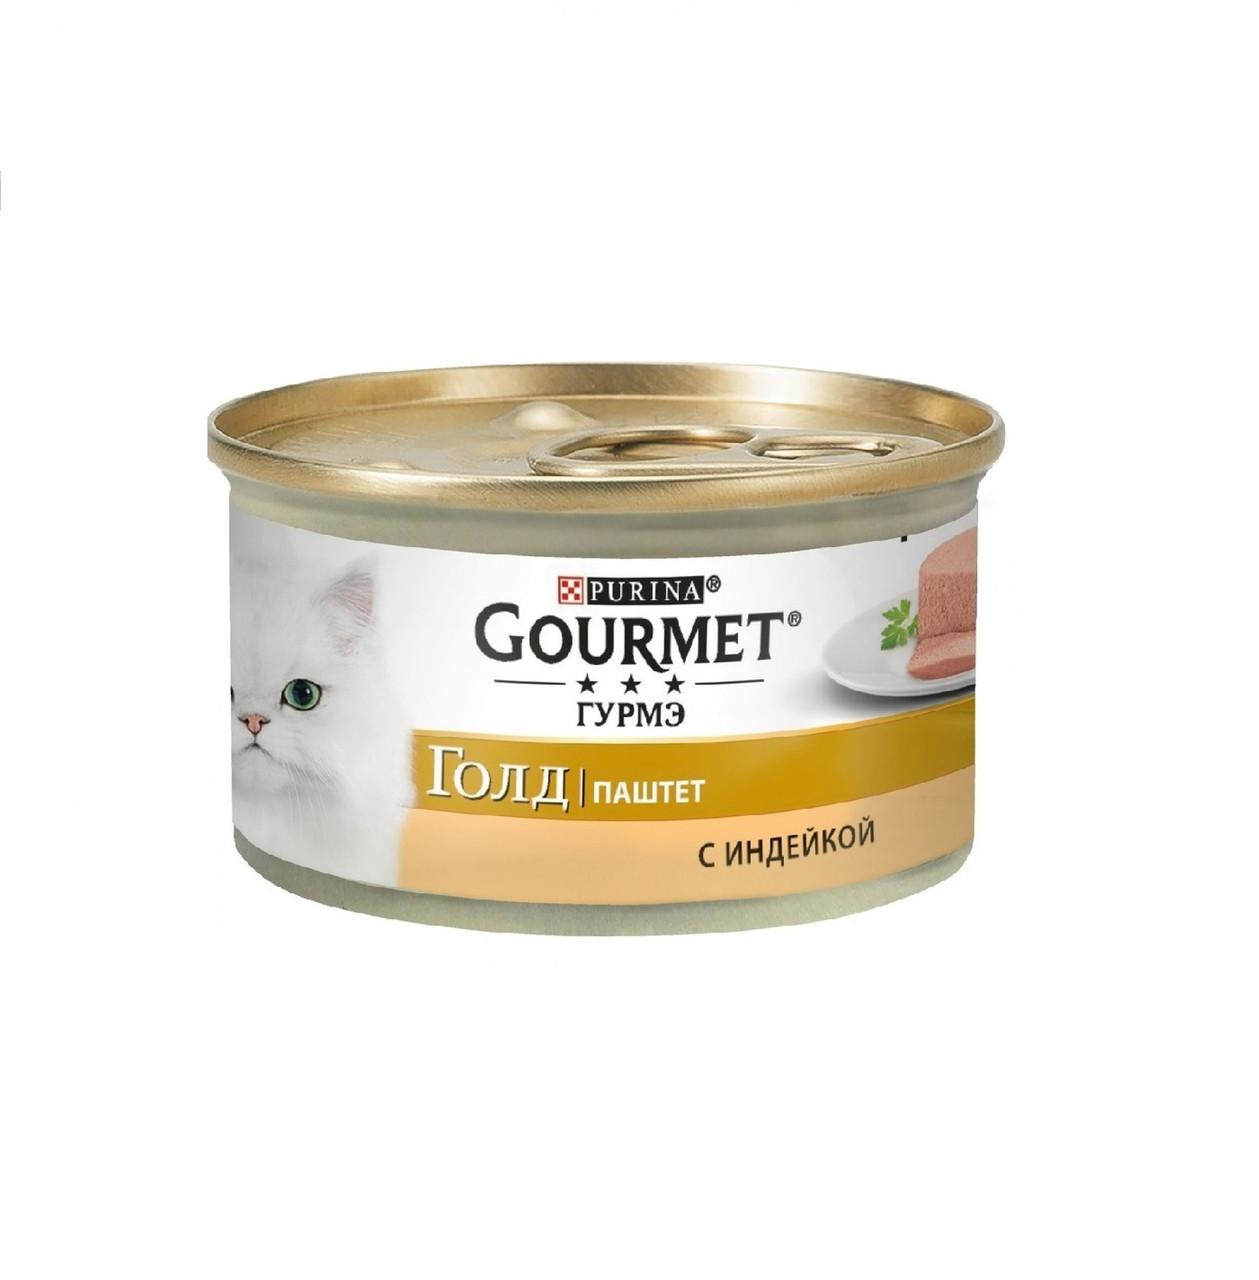 Gourmet Gold паштет с индейкой, банка 85 гр.